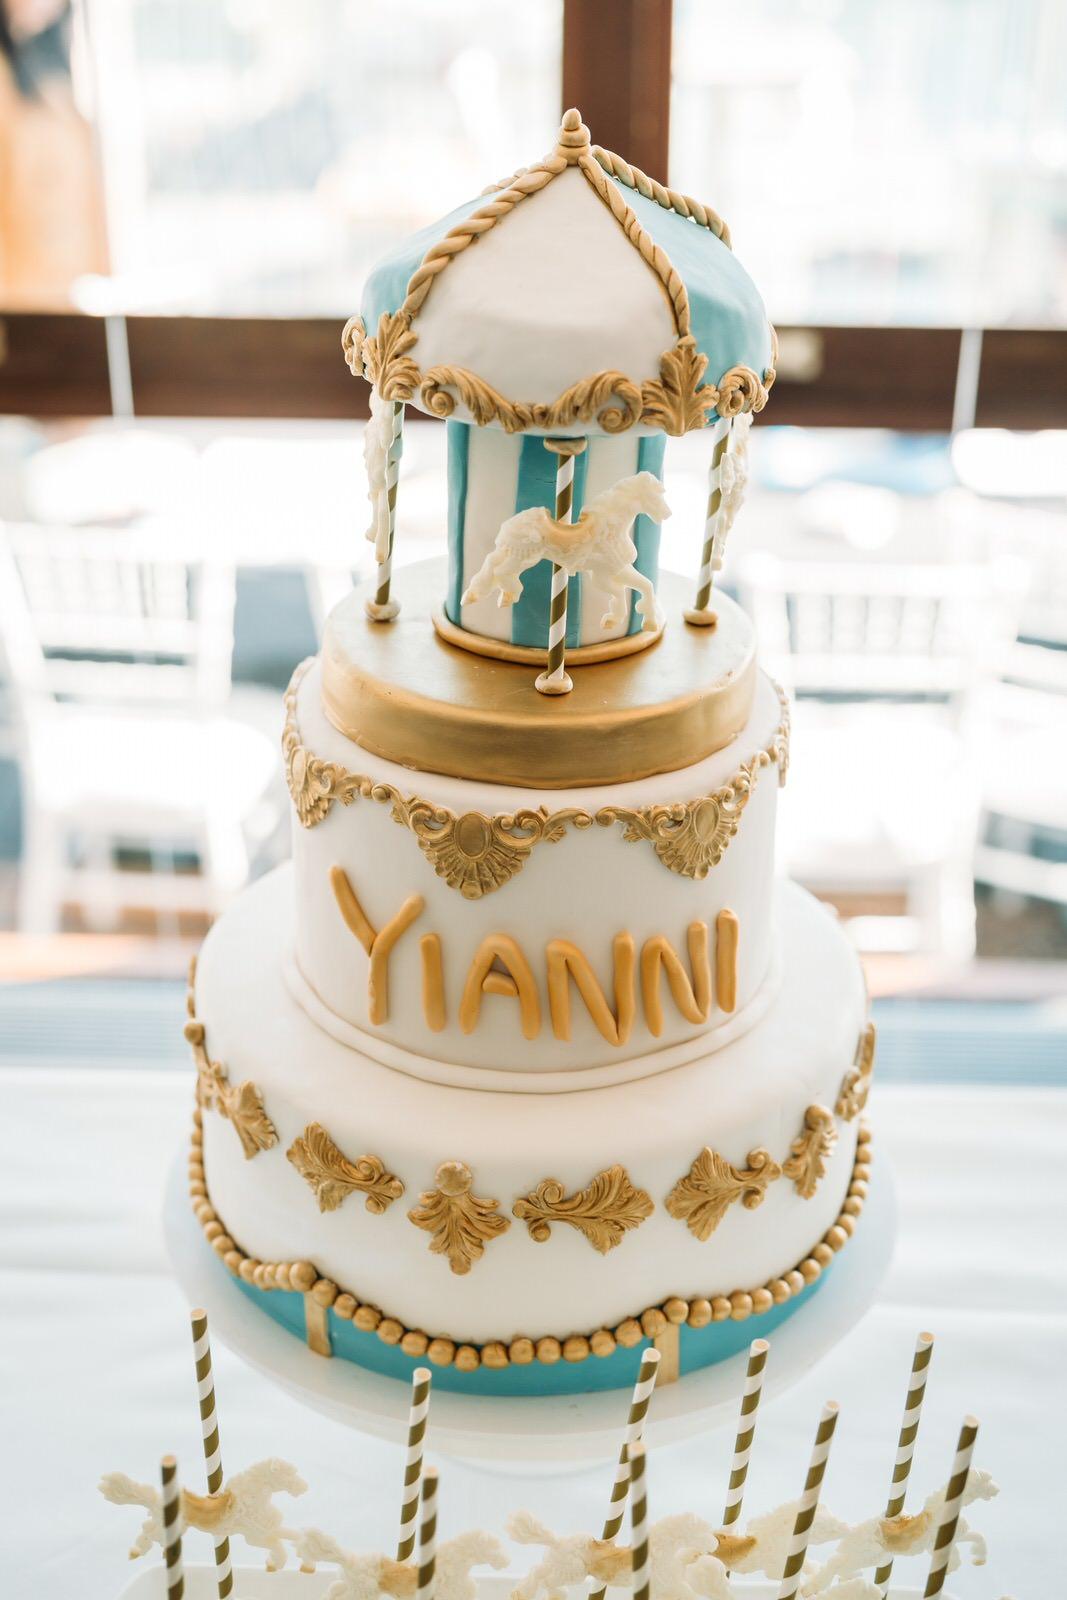 yianni-baptism-st-catherine-orthodox-mascot-laqua-192